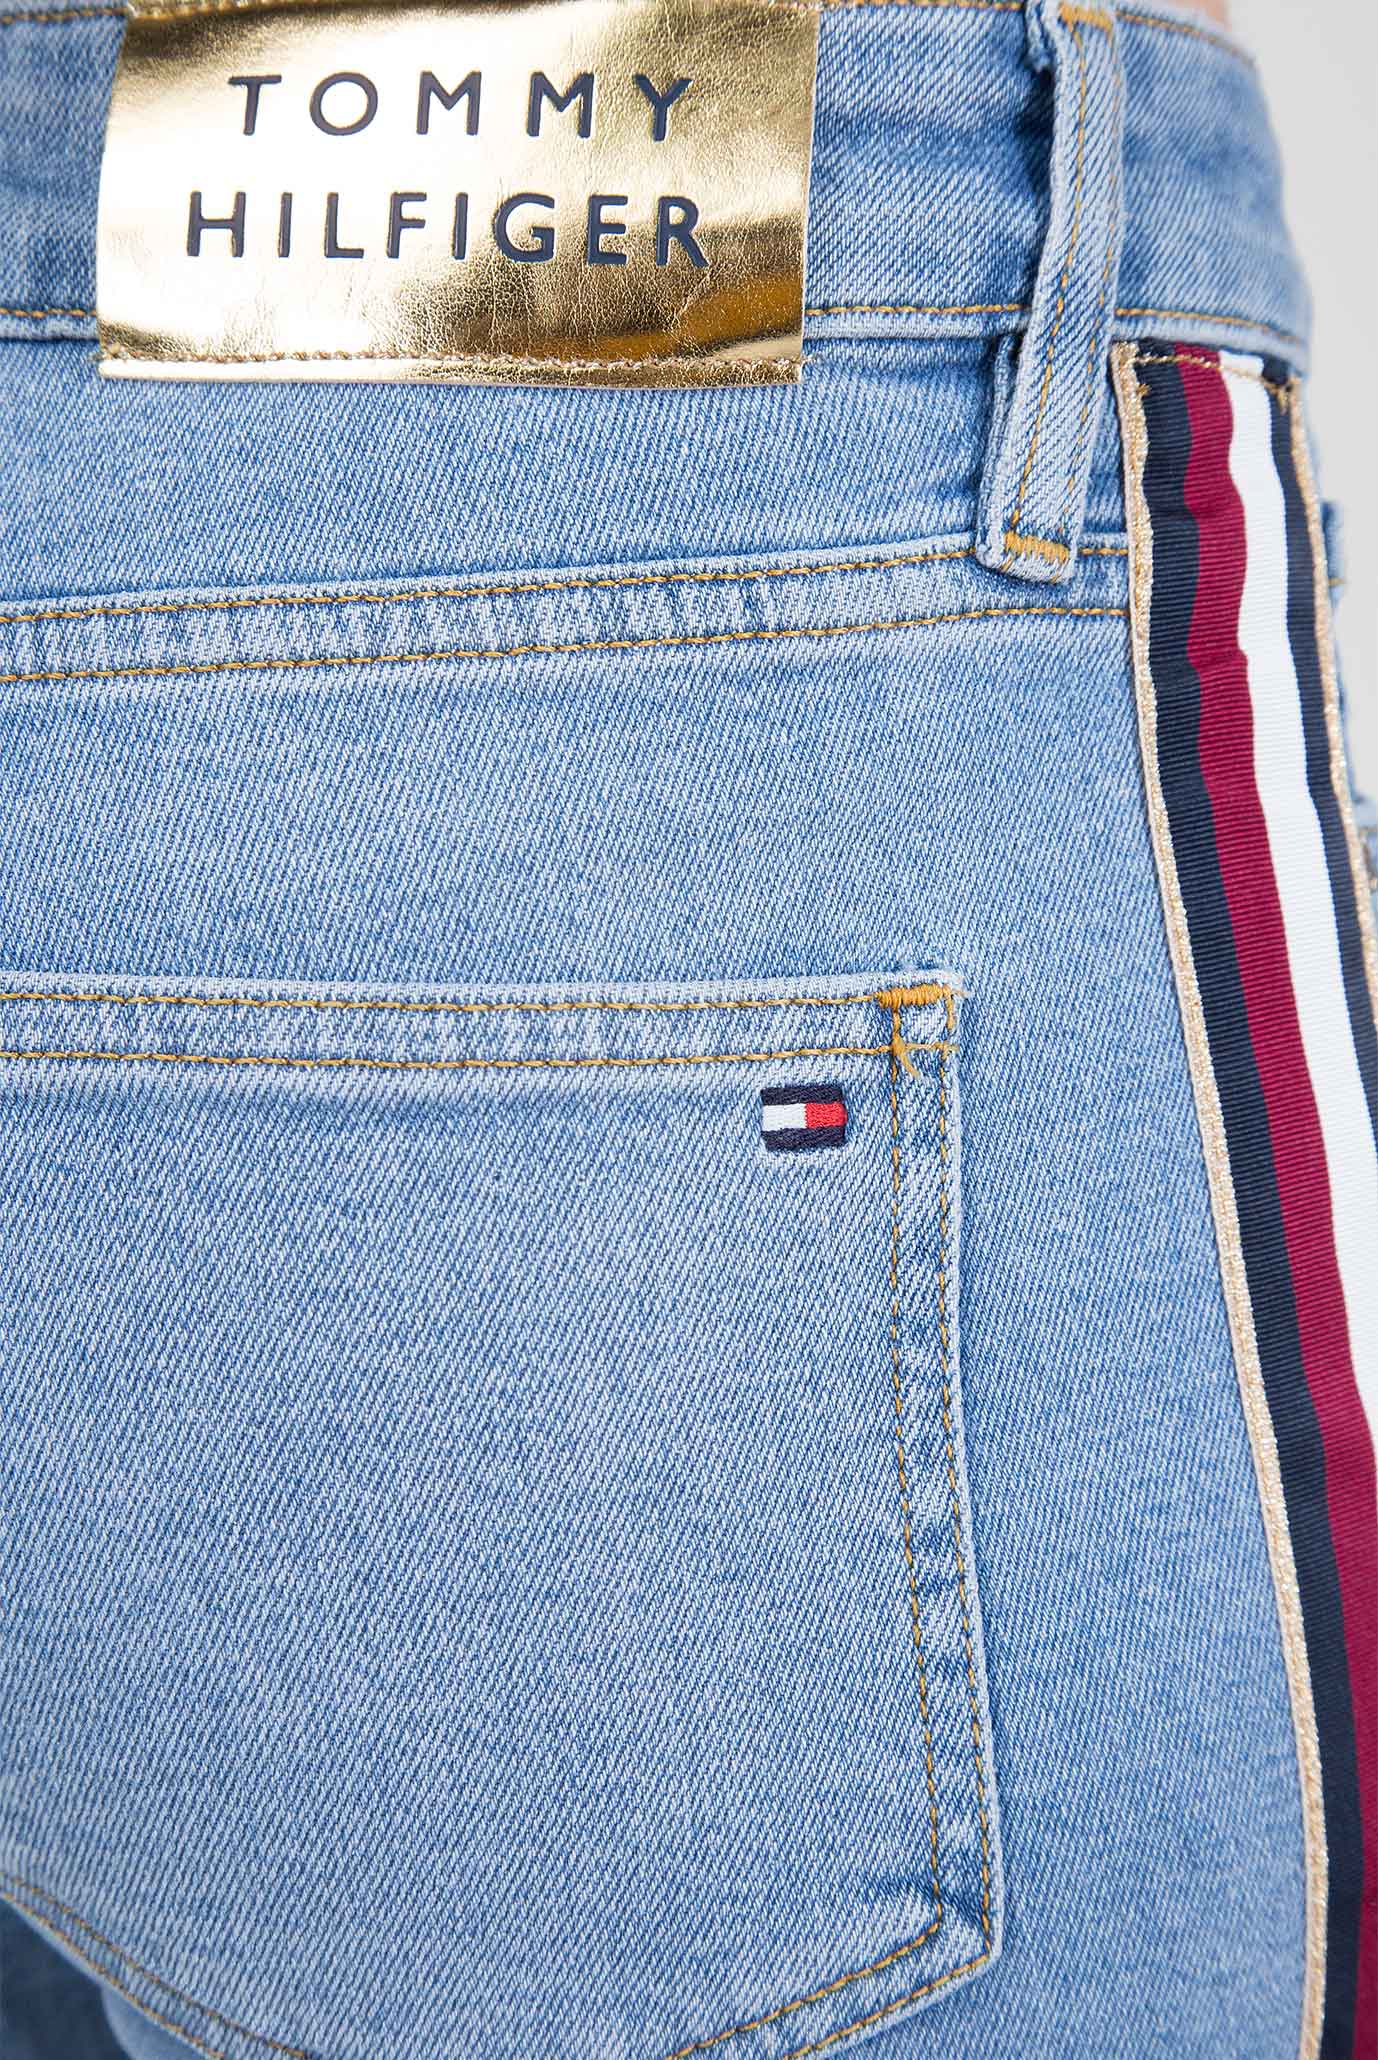 Купить Женские голубые джинсы ICON GRIFFIN RW CARLOTTA Tommy Hilfiger Tommy Hilfiger WW0WW22734 – Киев, Украина. Цены в интернет магазине MD Fashion